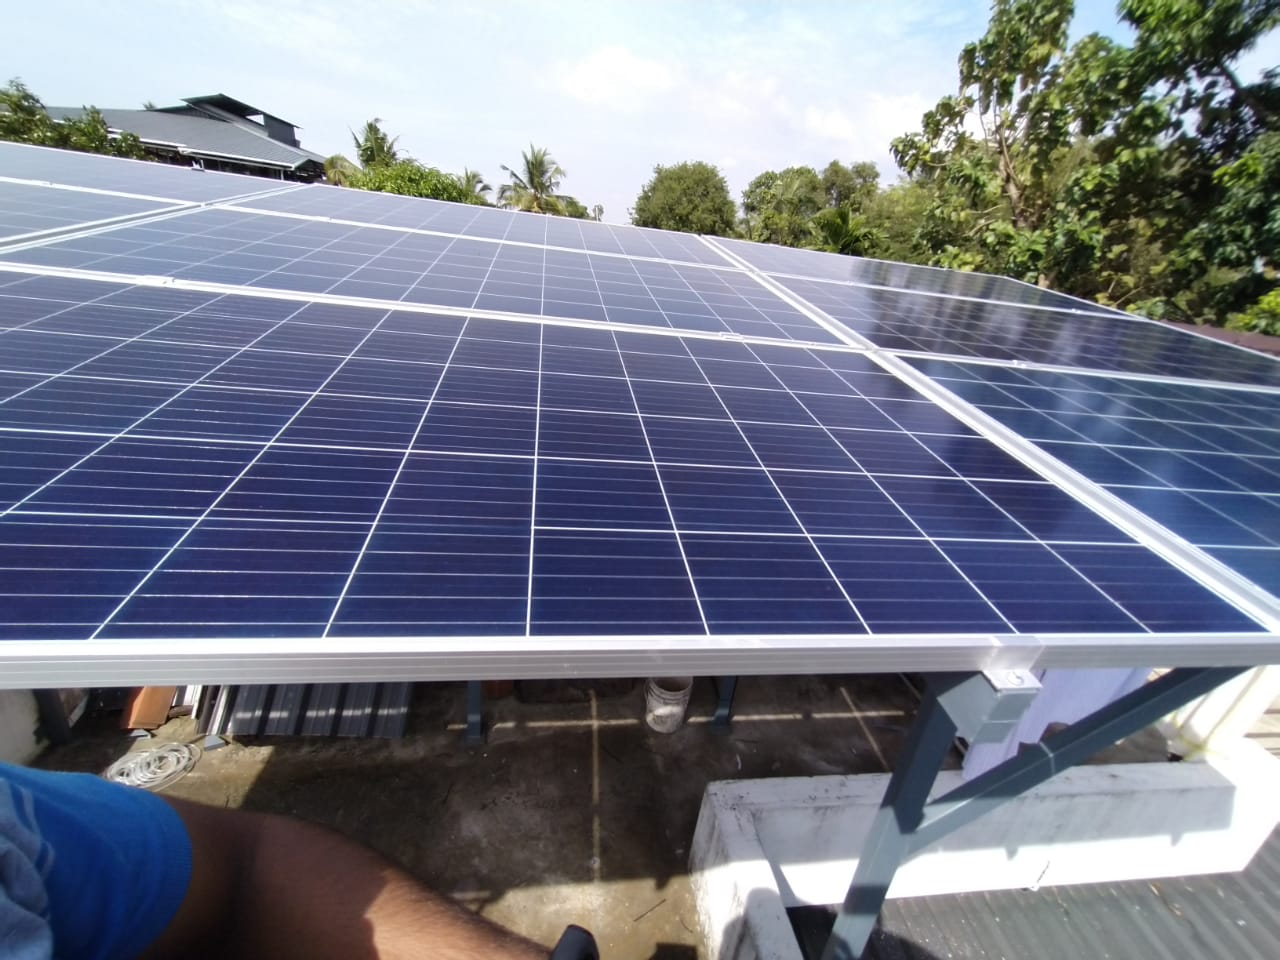 Sofar solar ongrid inverter solar ,Renewsys solar panel 335 W,Nettoor,kerala